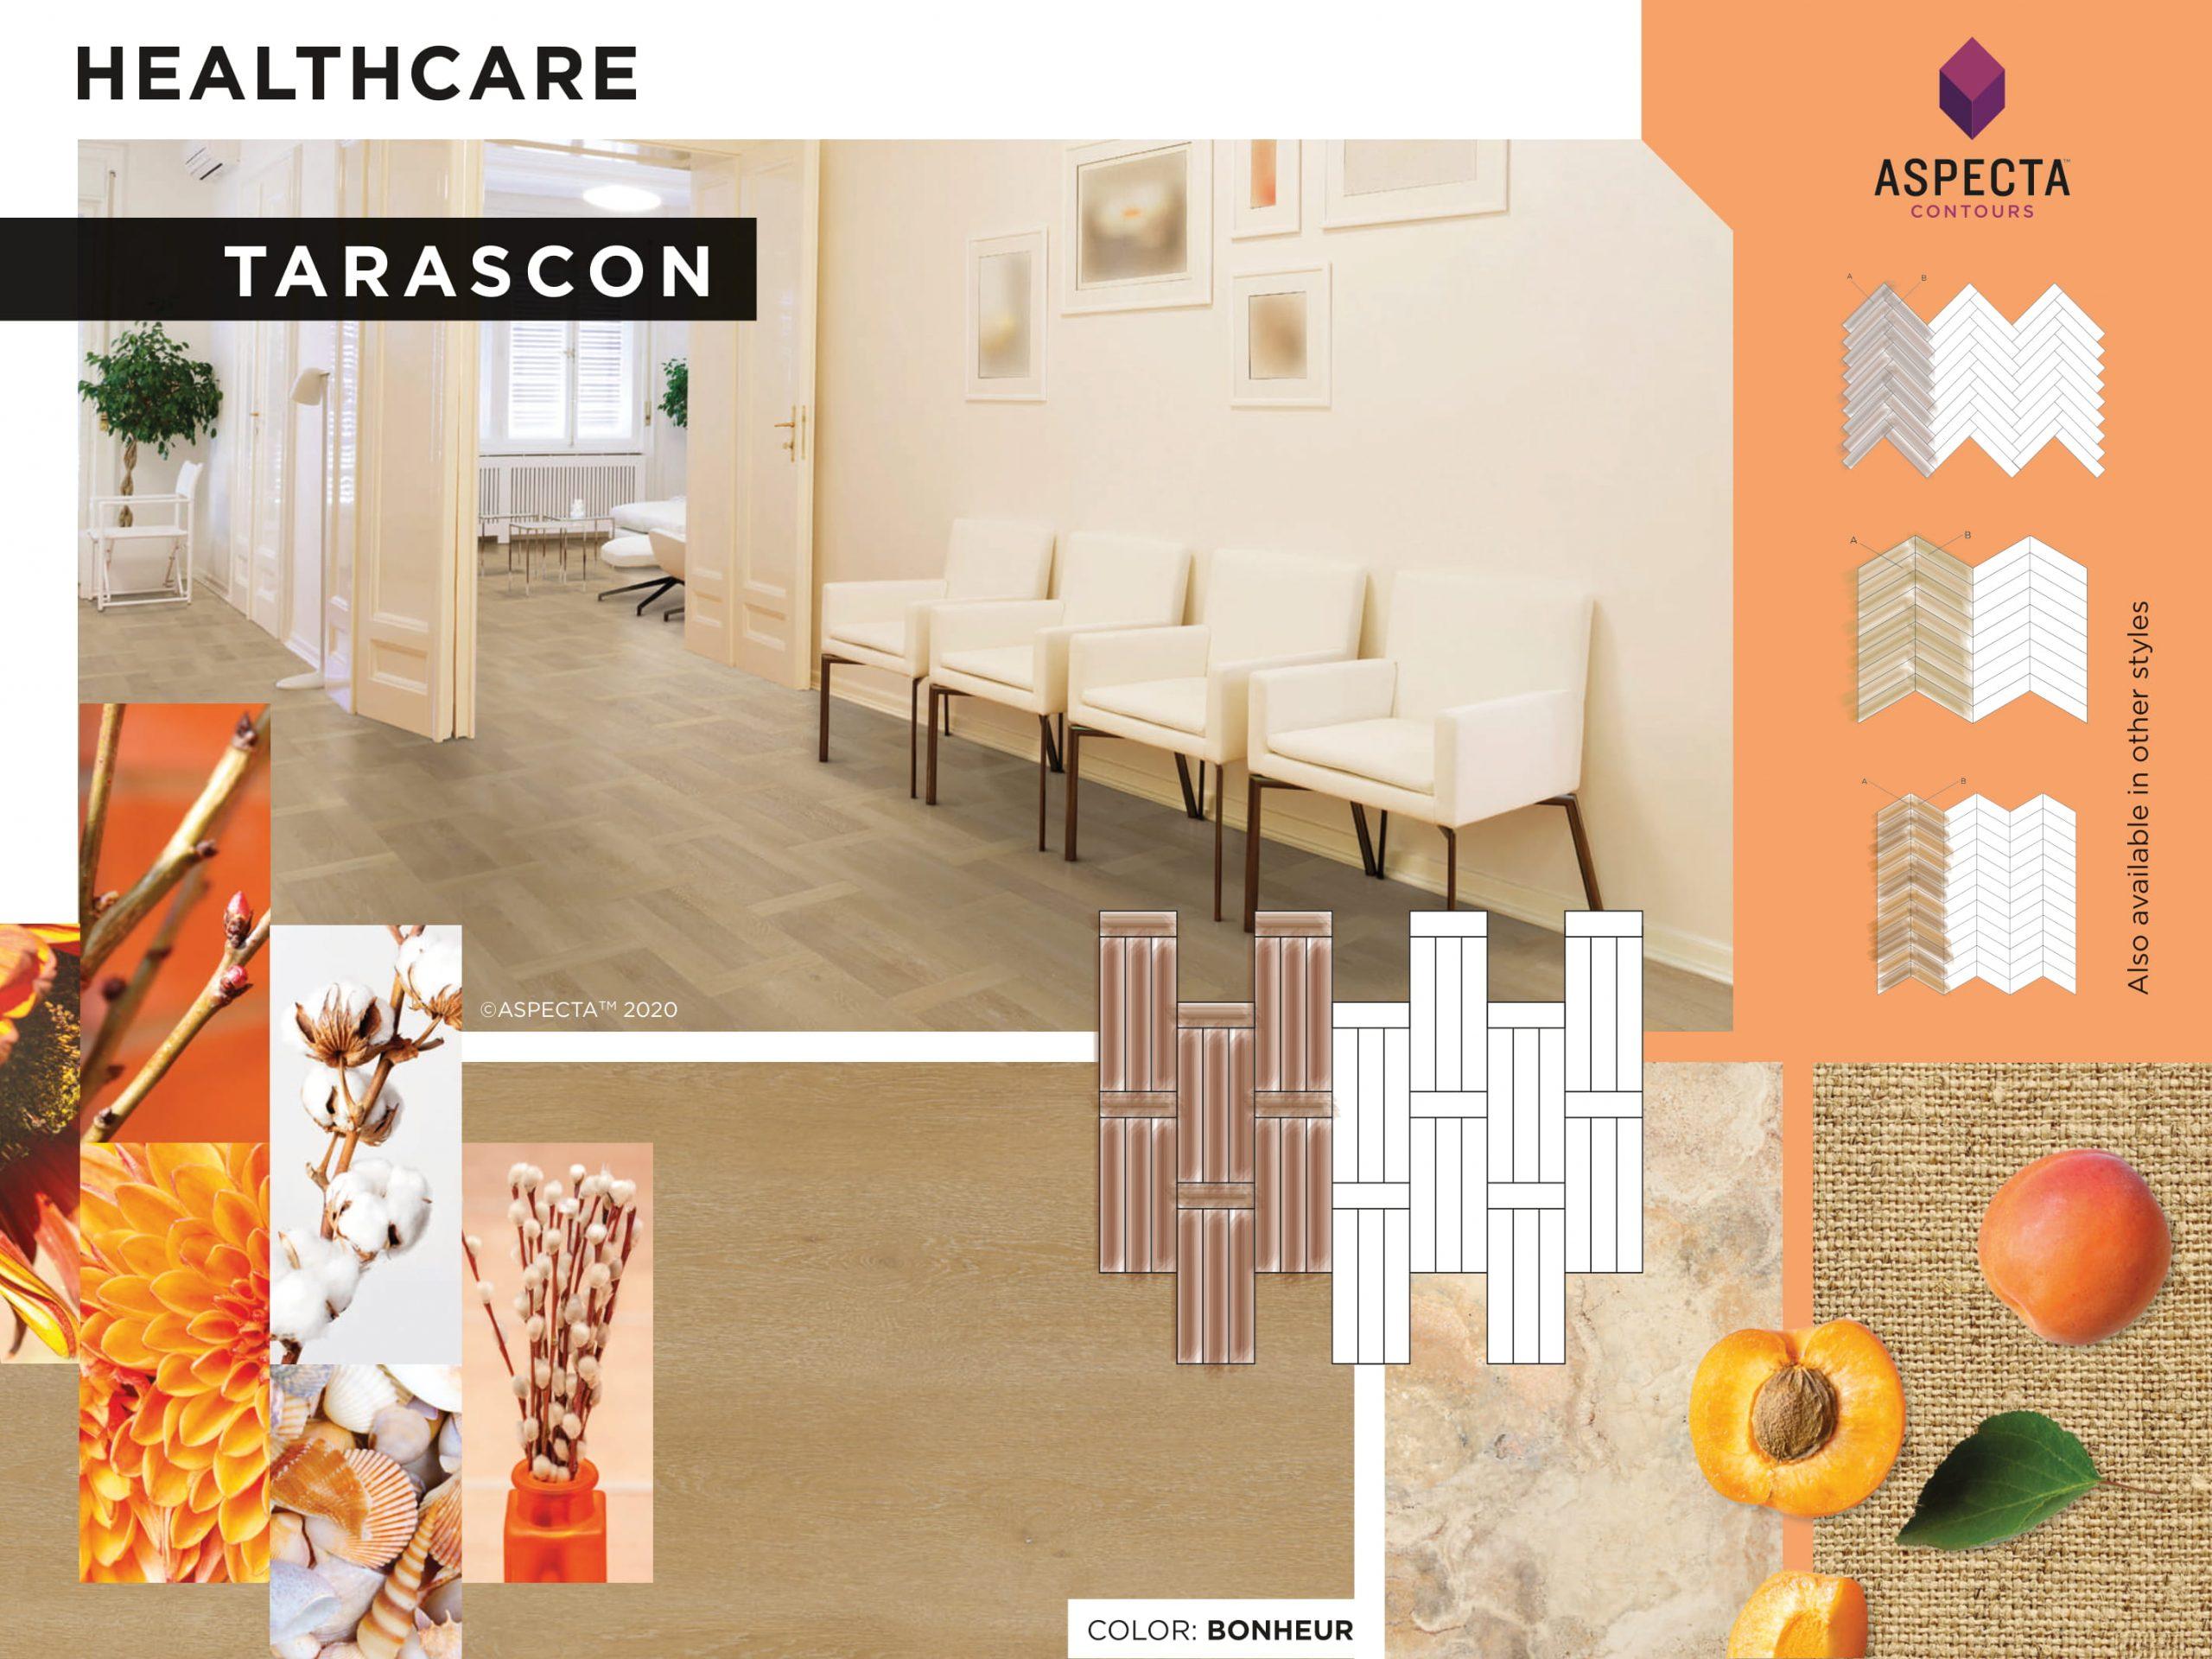 05_ASP_Contours_Moodboard_Tarascon_Healthcare_web_04_2020-1